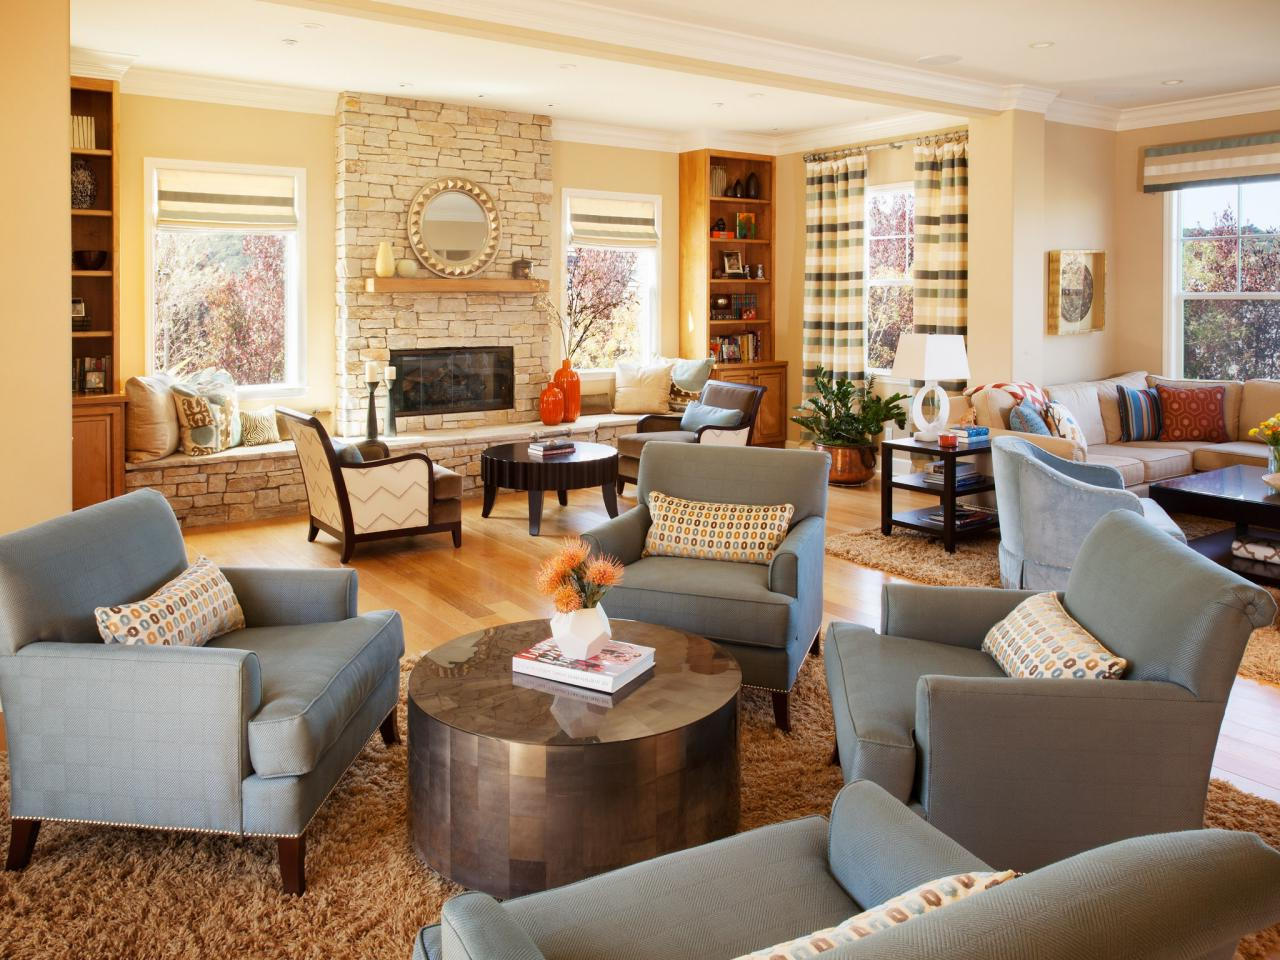 beautiful modern interior design for decorating living rooms ideas